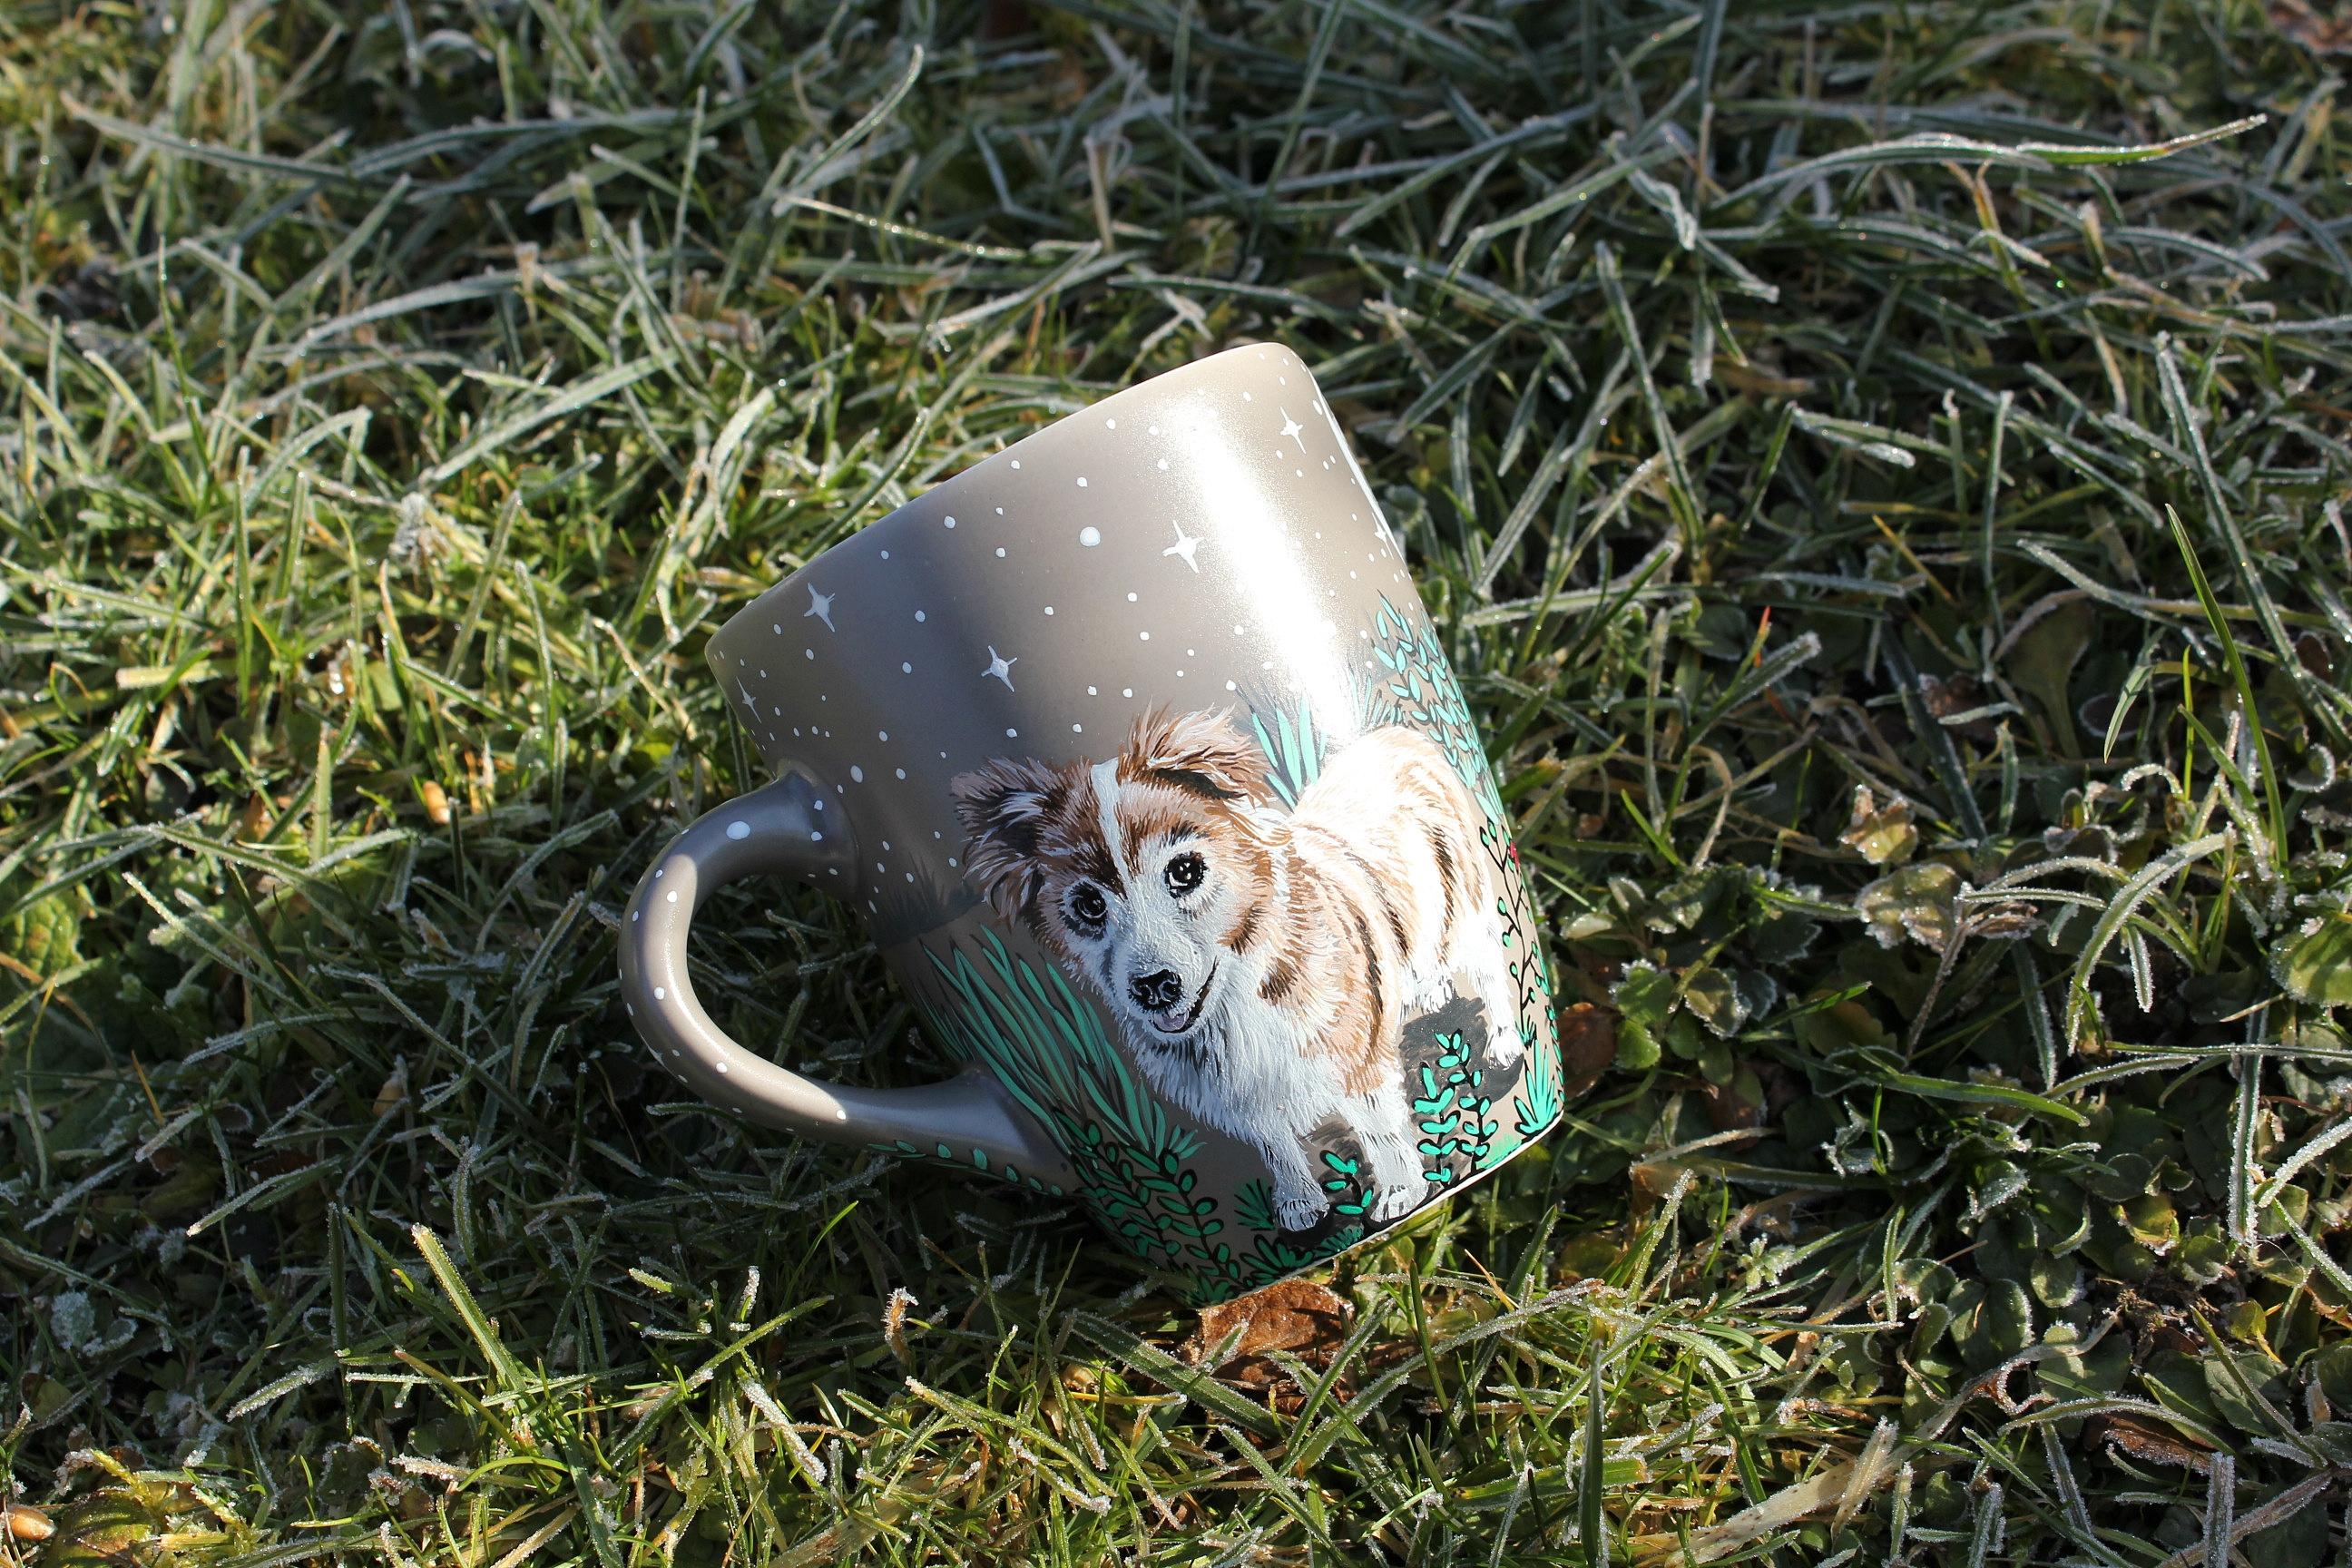 Personalizet custom pet mug coffe tea cup hand painted handmade illustration mug pet forest meadow bird cat moon grass pine trees mug etsy store